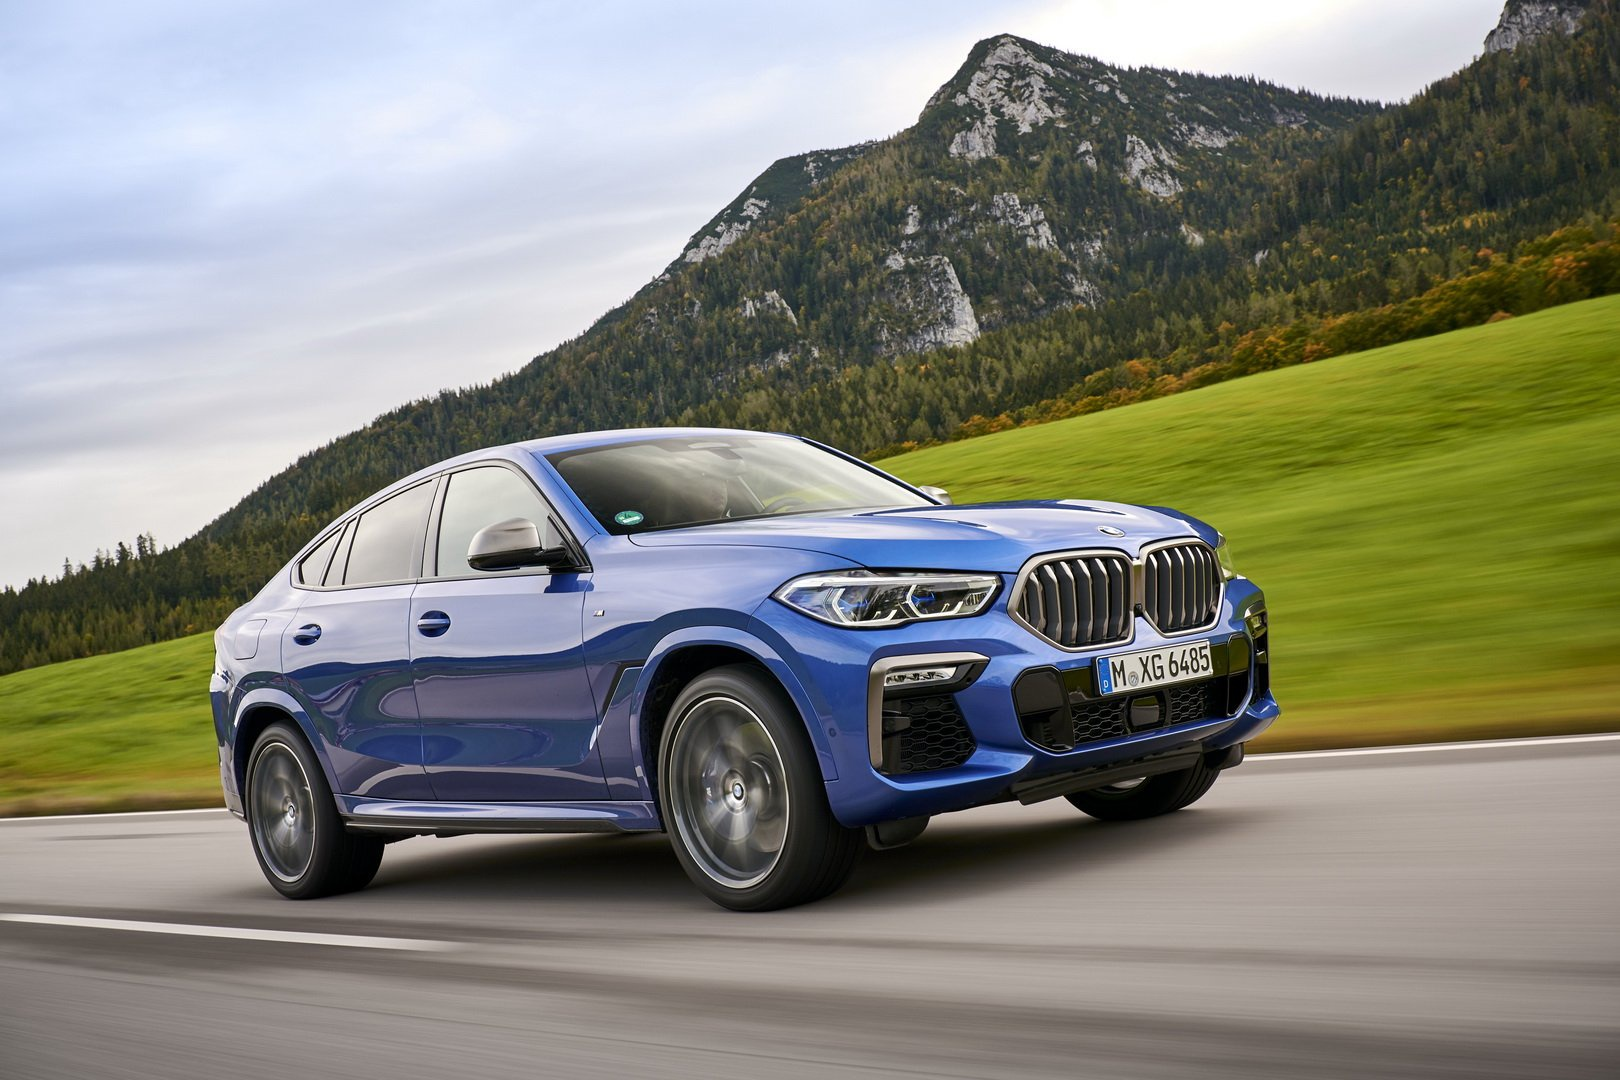 BMW X6 2020 - SUV voi suc manh sieu xe hinh anh 1